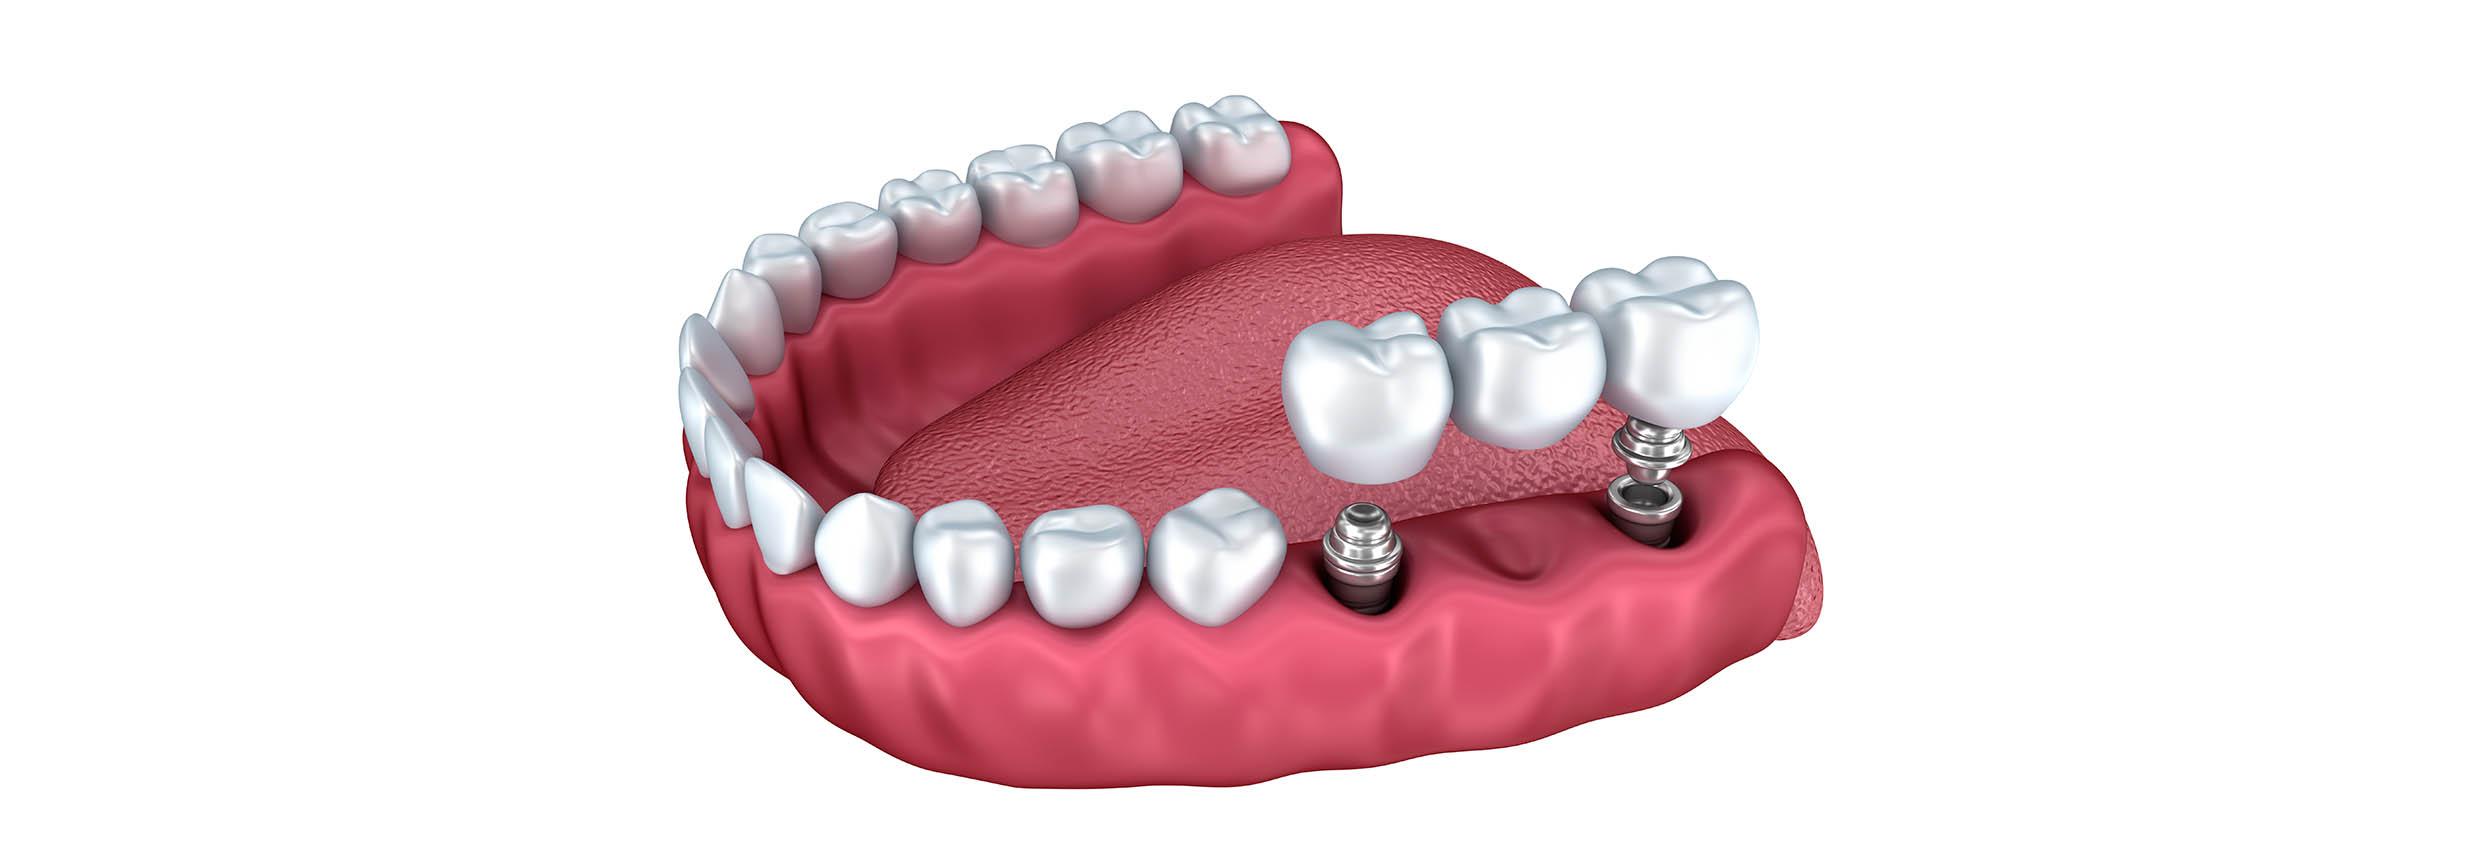 Implantologia dentale | Verona | Studio dentistico a Verona | Studio dentistico Muraro